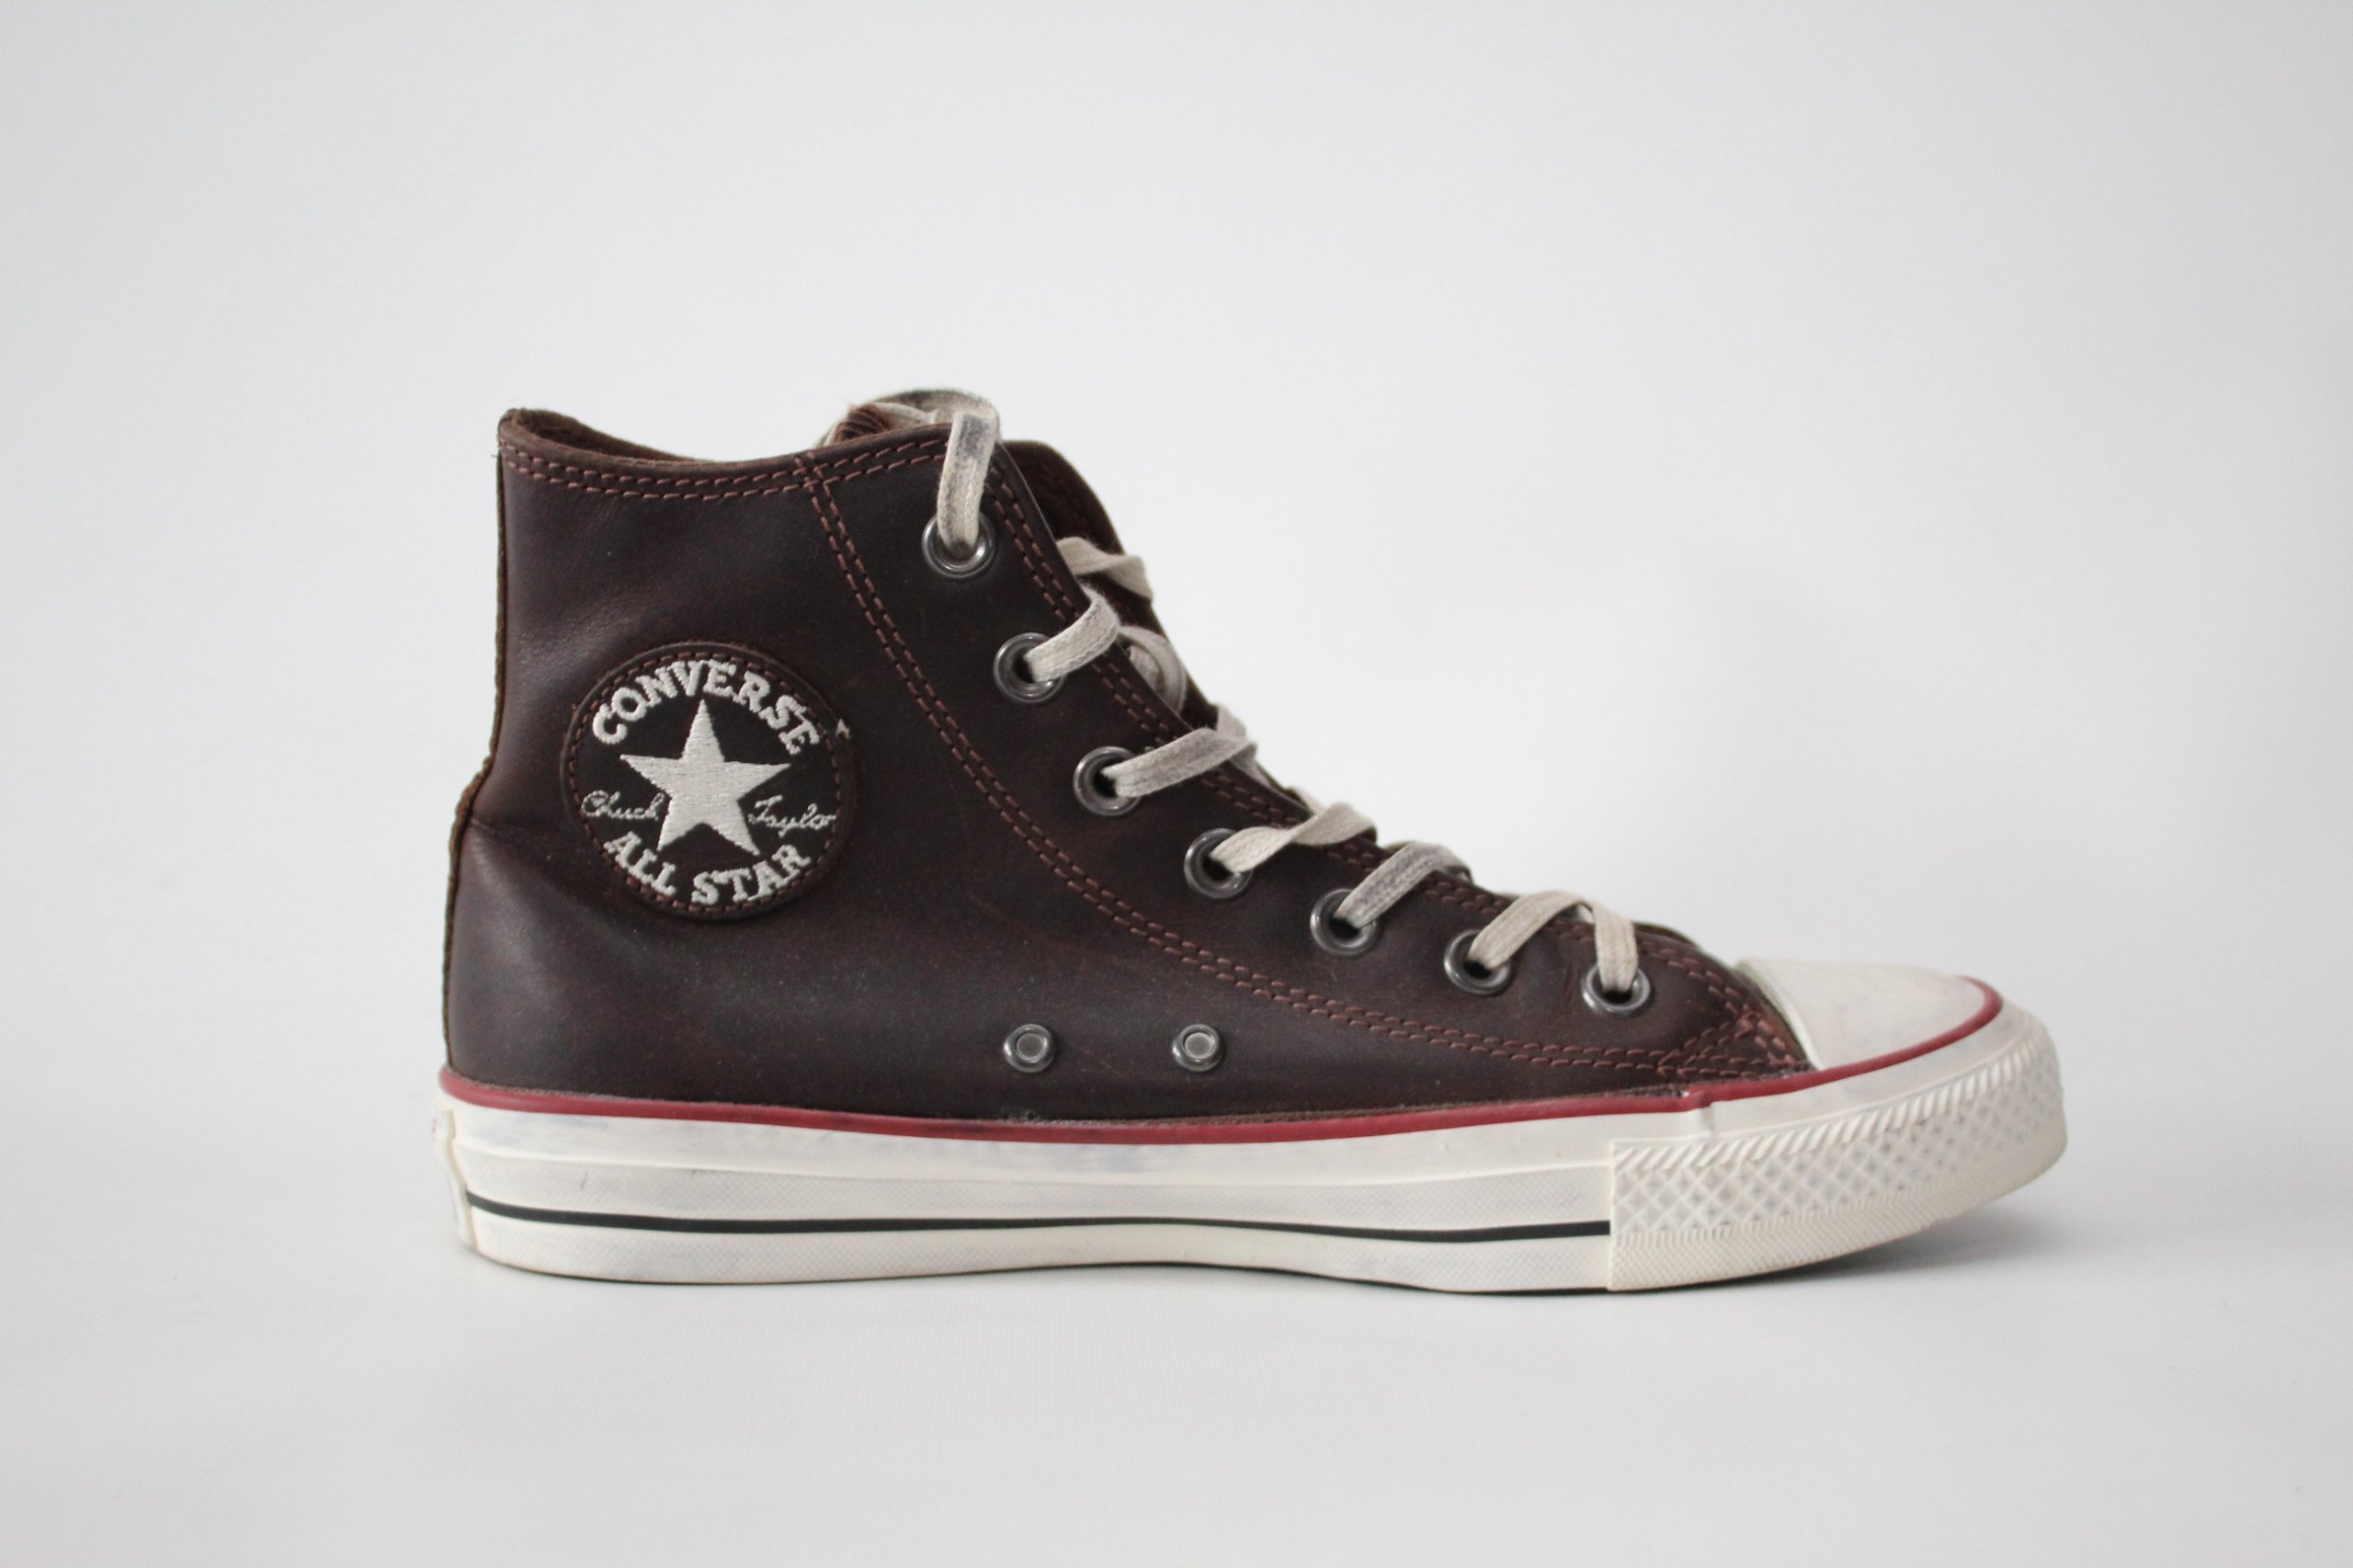 Produkt z Outletu: Wysokie Trampki Converse All Star Bordowe